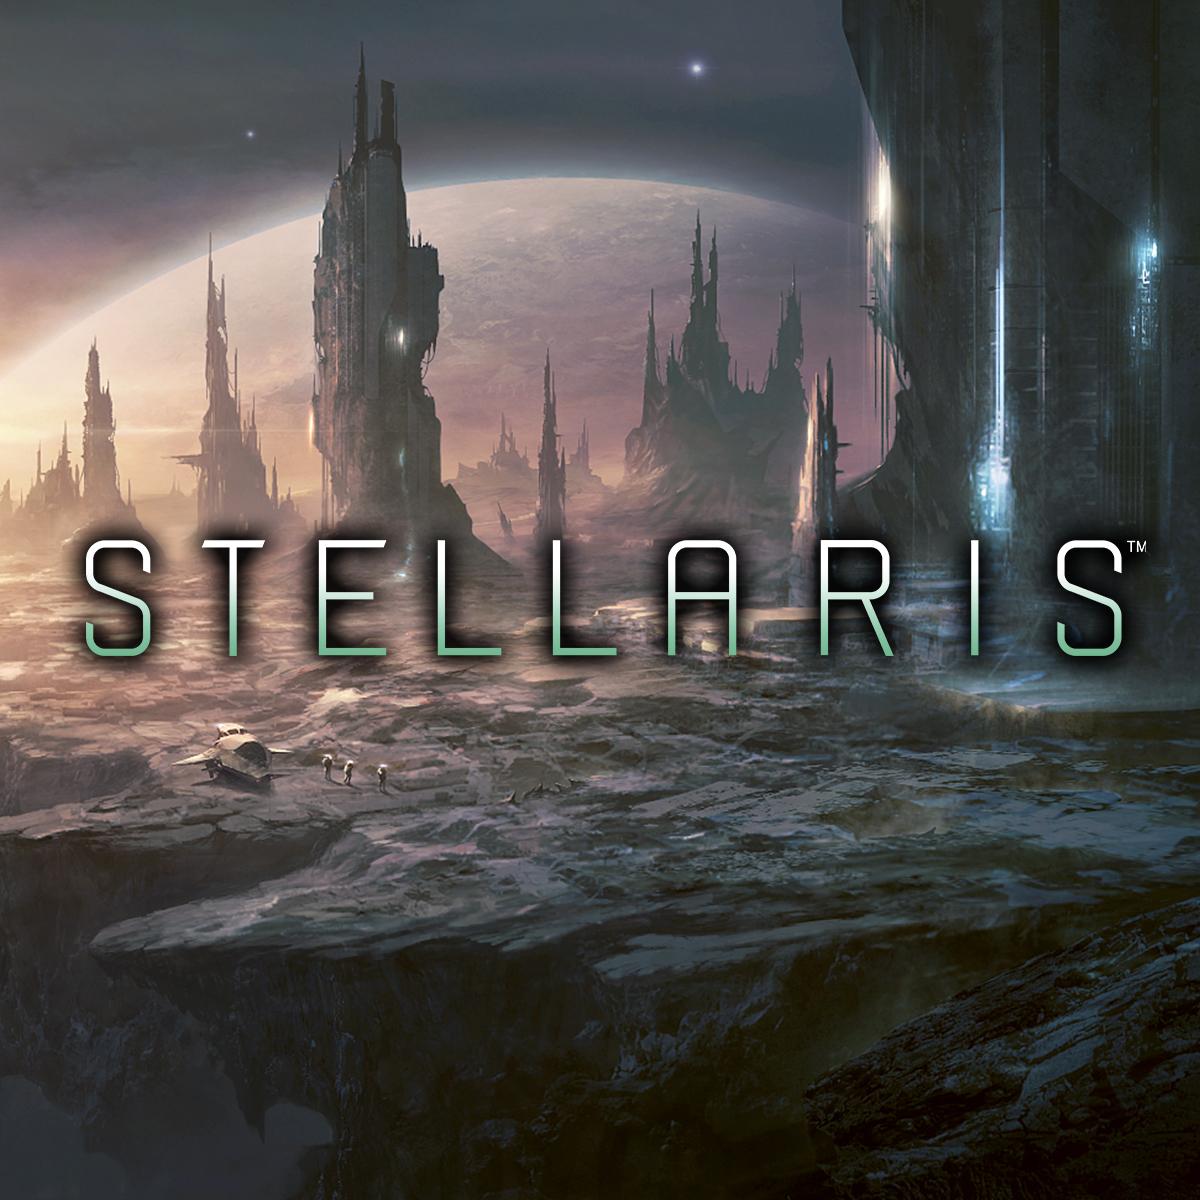 Stellaris - Ether Drake - TTCommunity